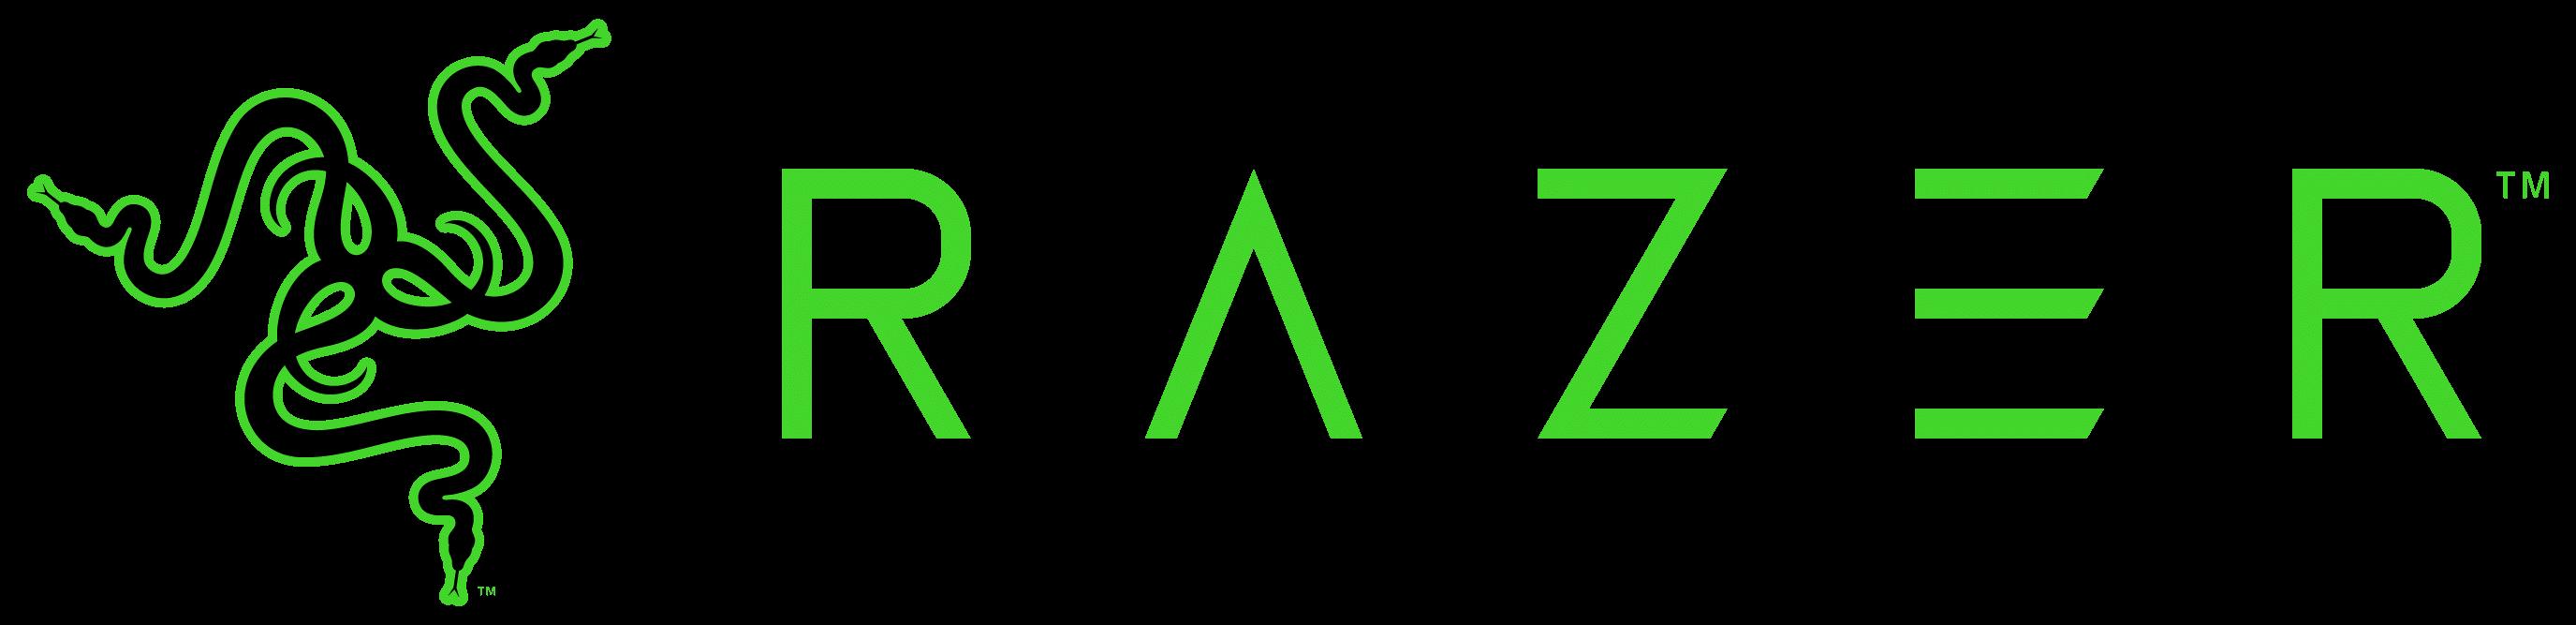 Il logo Razer.